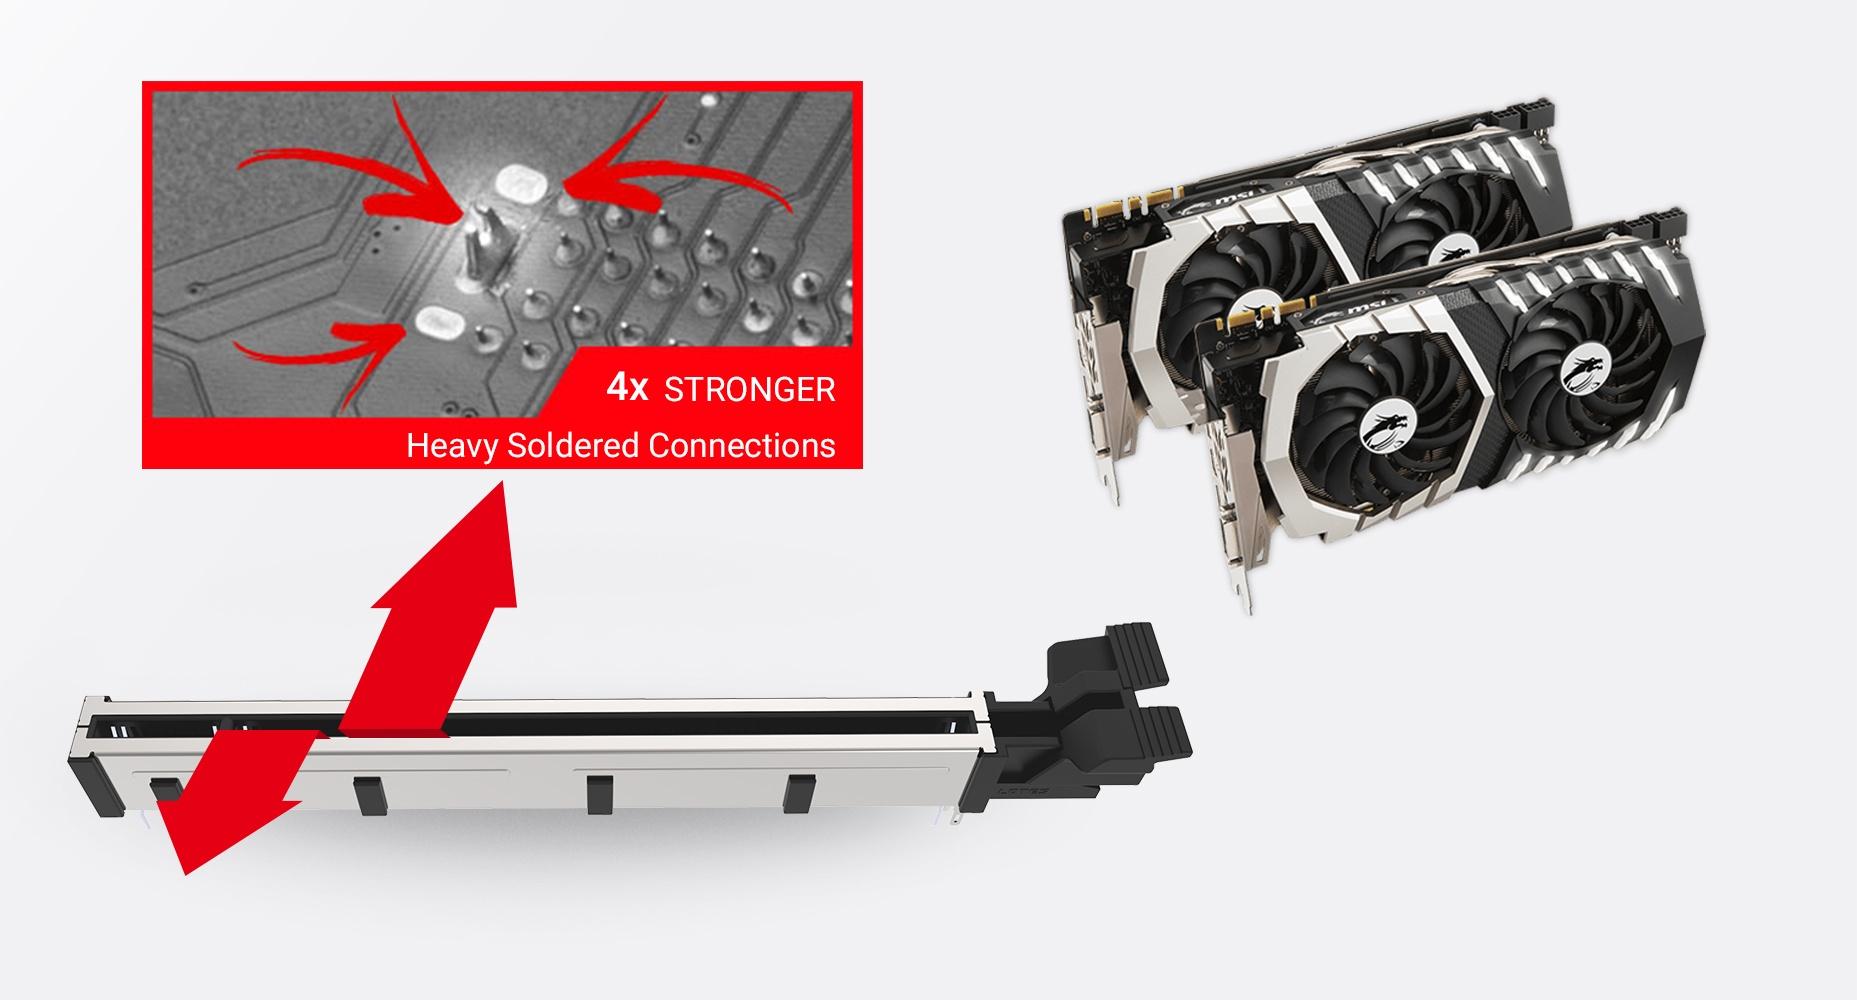 MSI MAG B550 TORPEDO MULTIPLE GPU SUPPORTS AND STEEL ARMOR